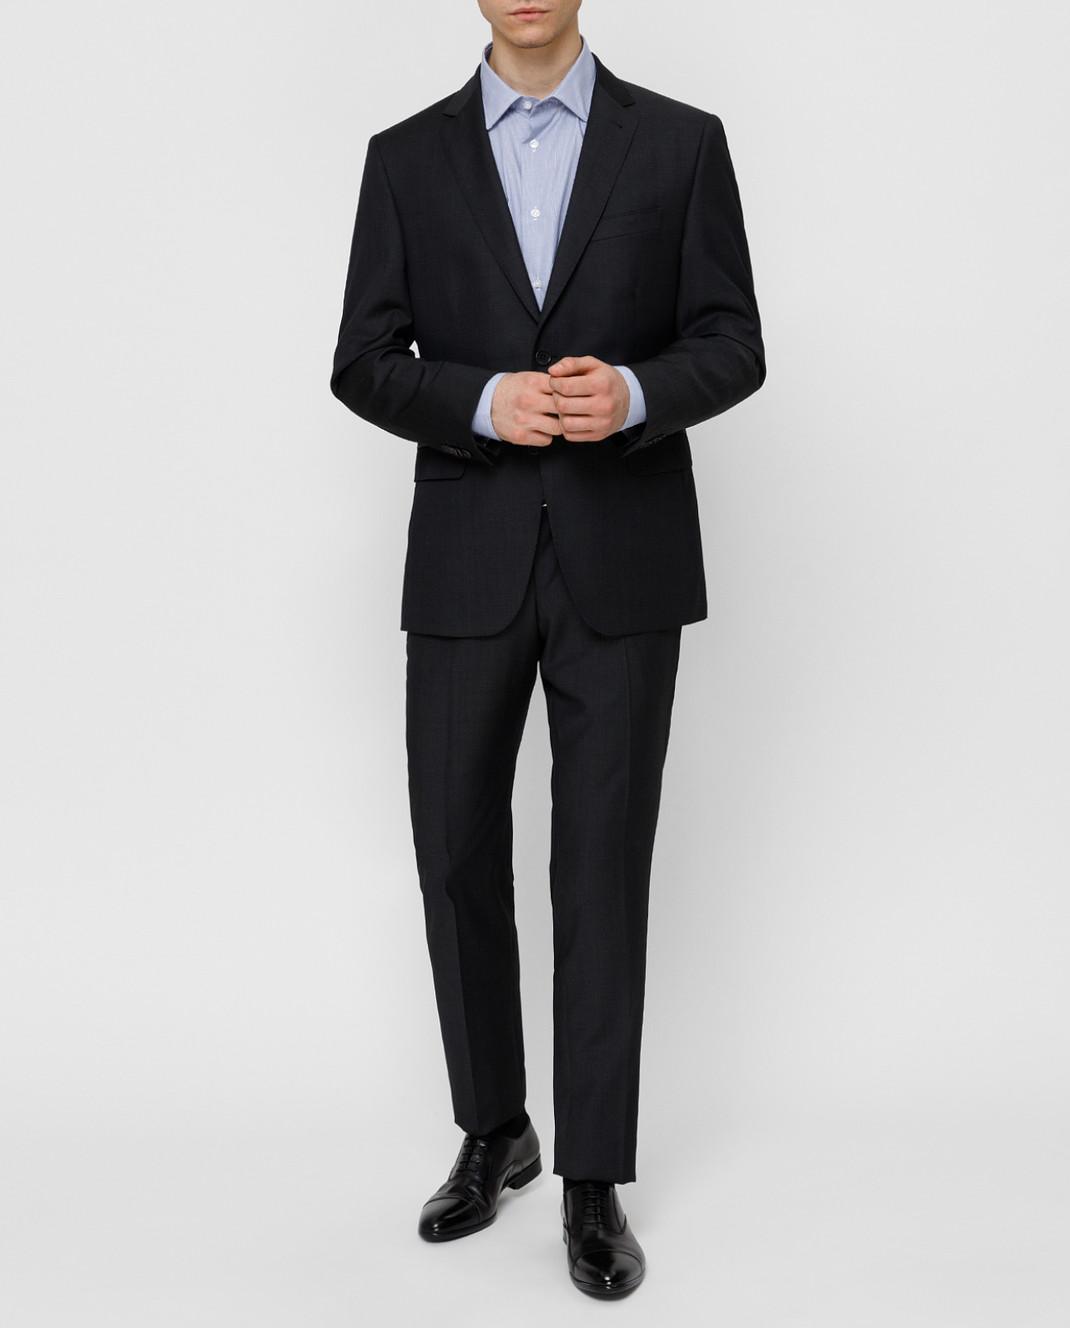 Fradi Тёмно-синий костюм 192AJ7025944 изображение 2